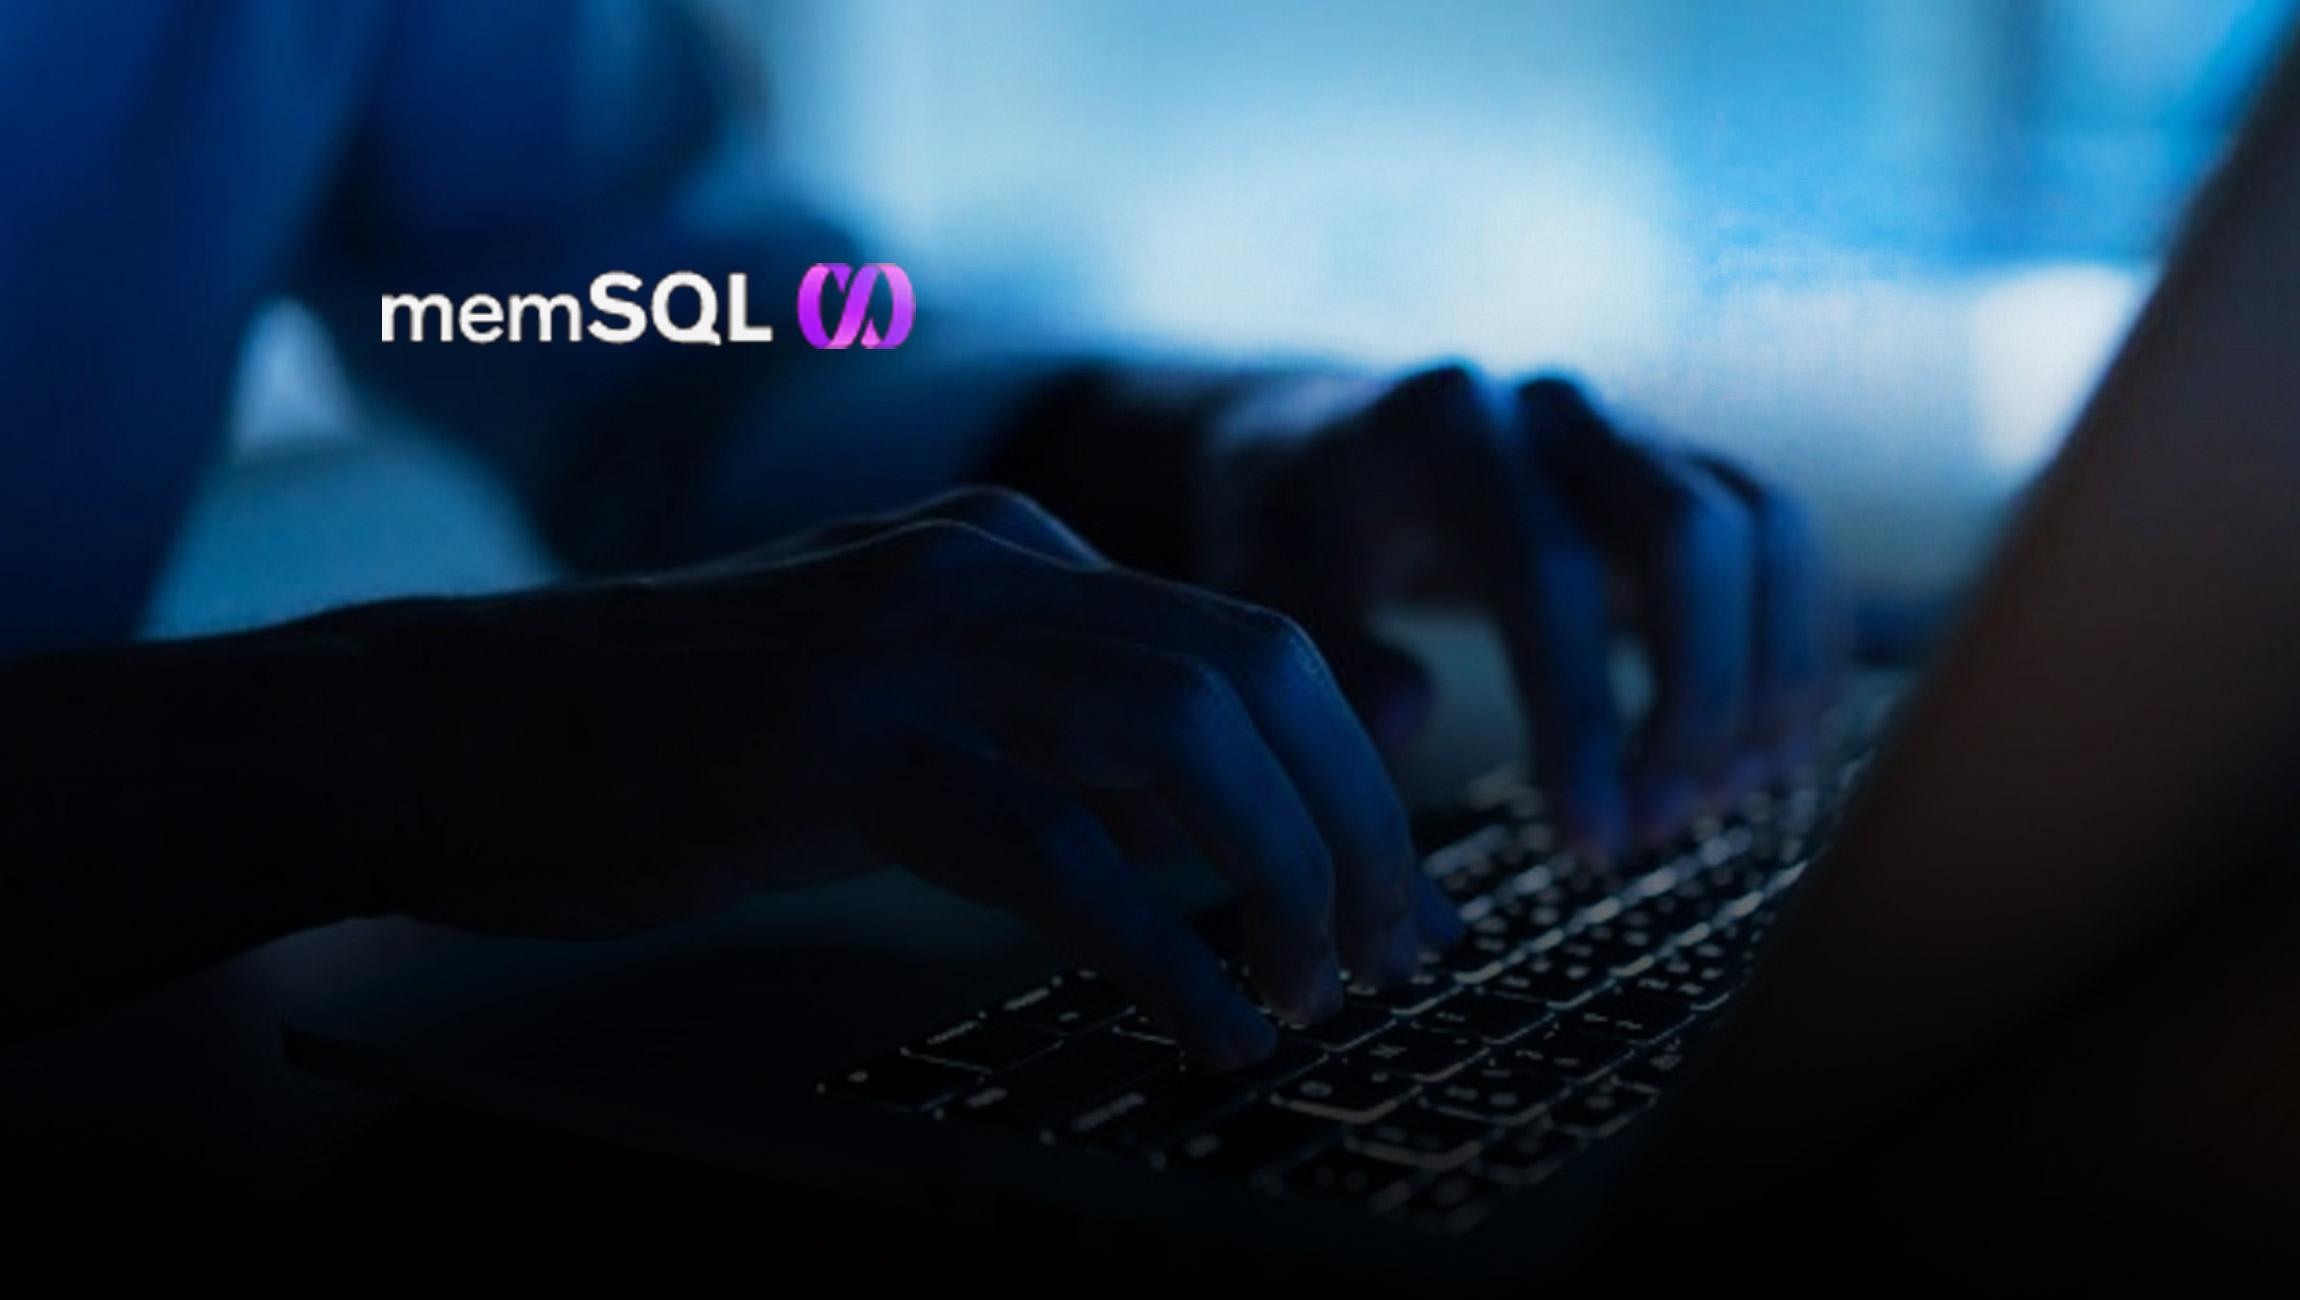 MemSQL Changes Name to SingleStore